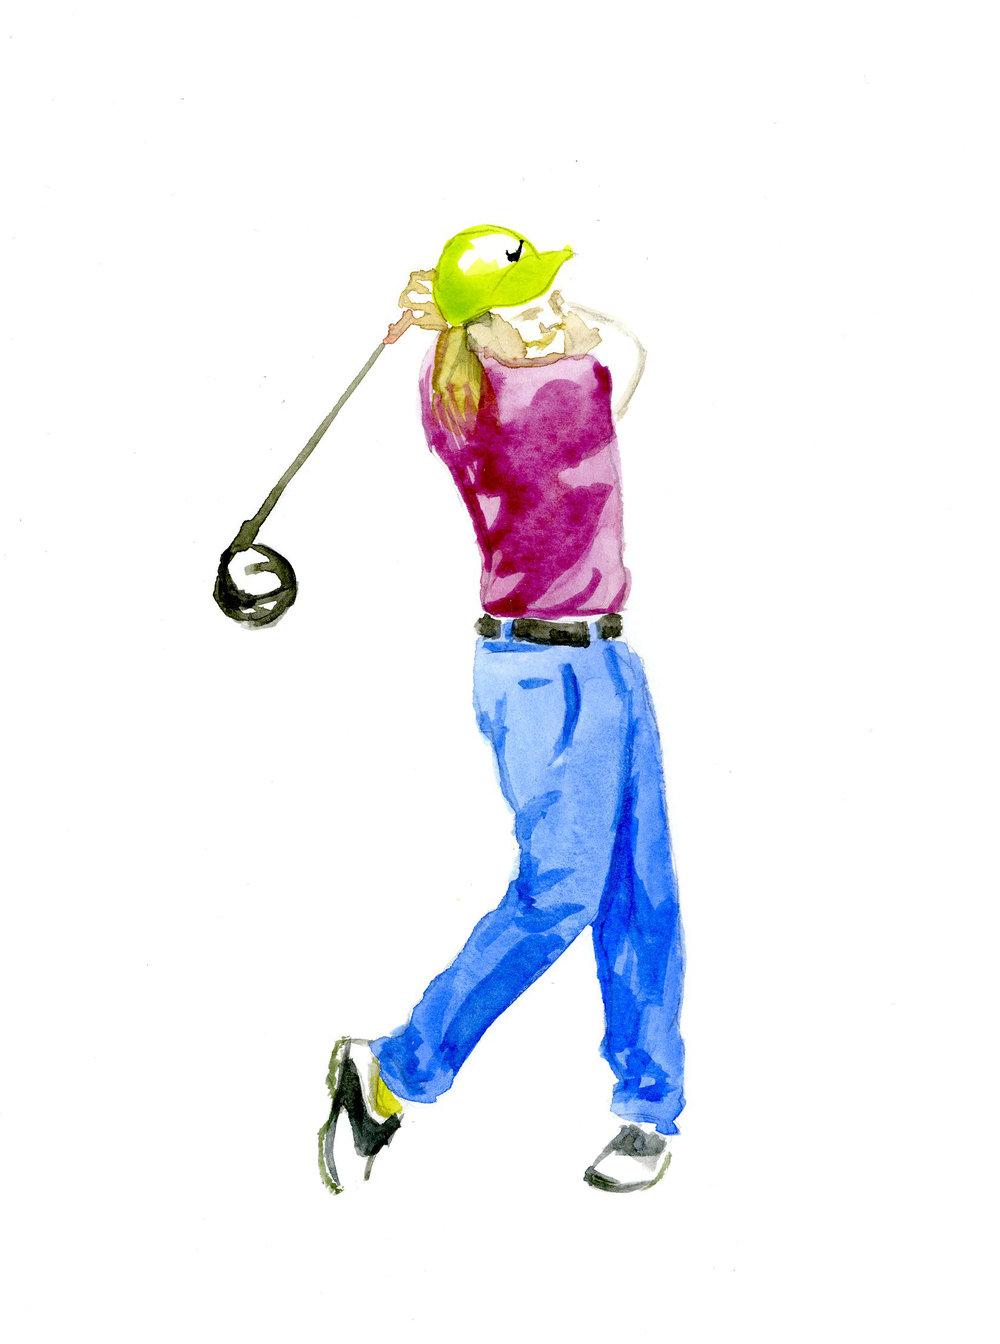 golf2017_02.jpg